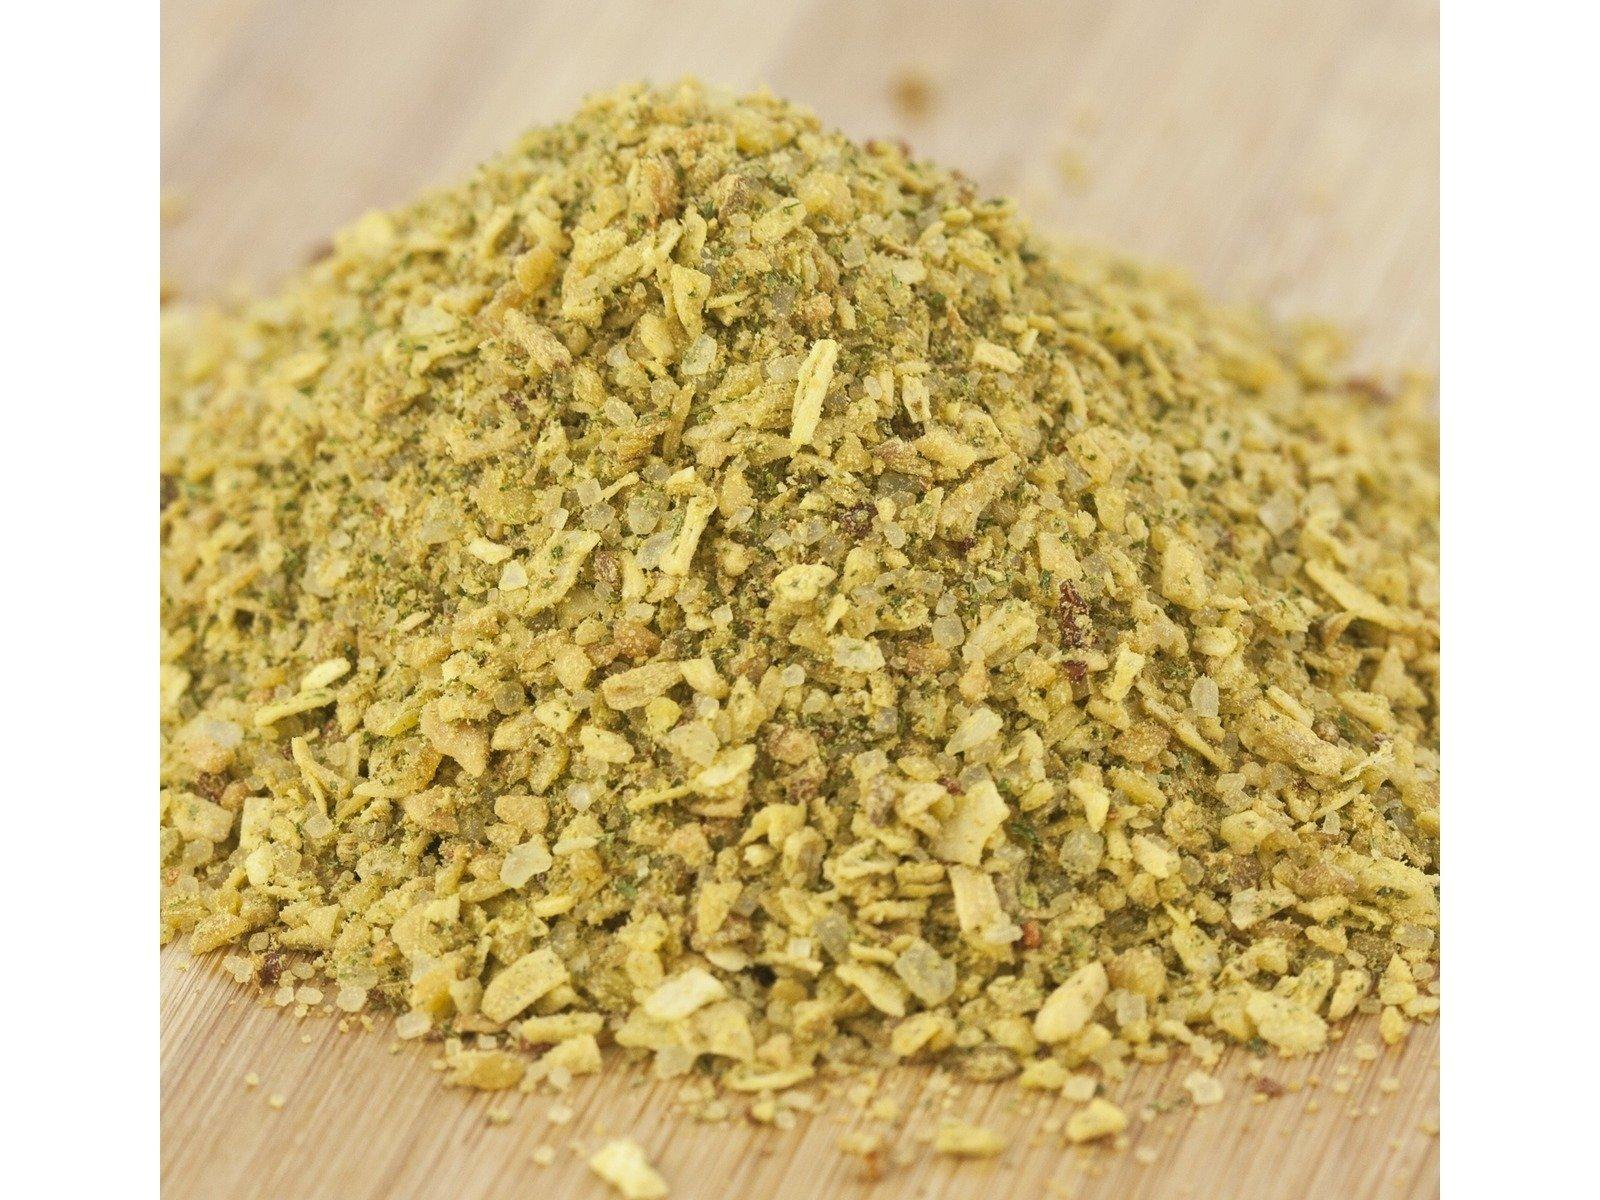 All Natural Garlic & Herb Seasoning - No MSG- One Pound